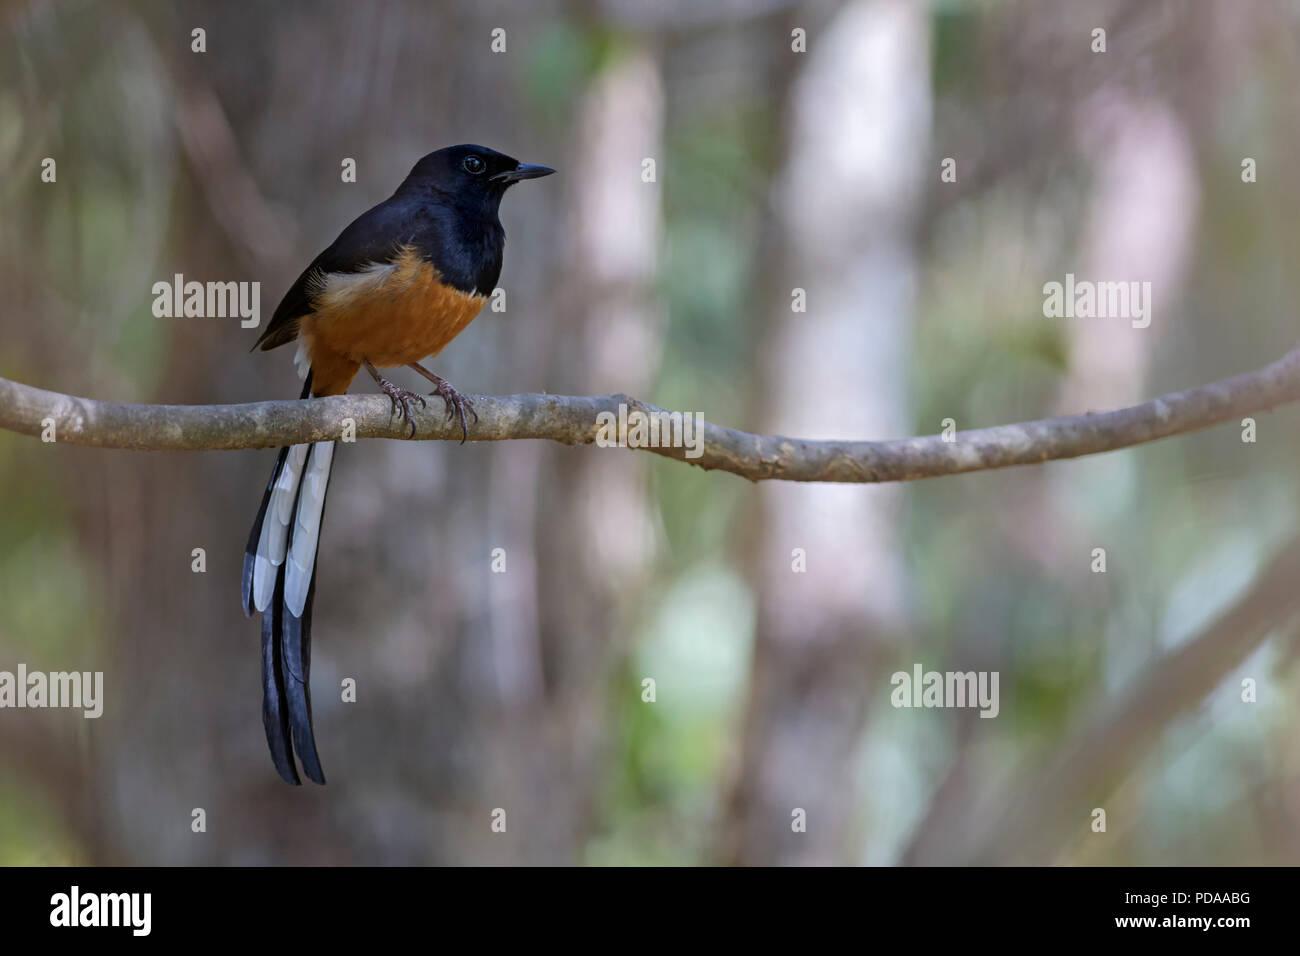 White-rumped Shama - Copsychus malabaricus, beautiful iconic  perching bird from Asian forests, Sri Lanka. - Stock Image